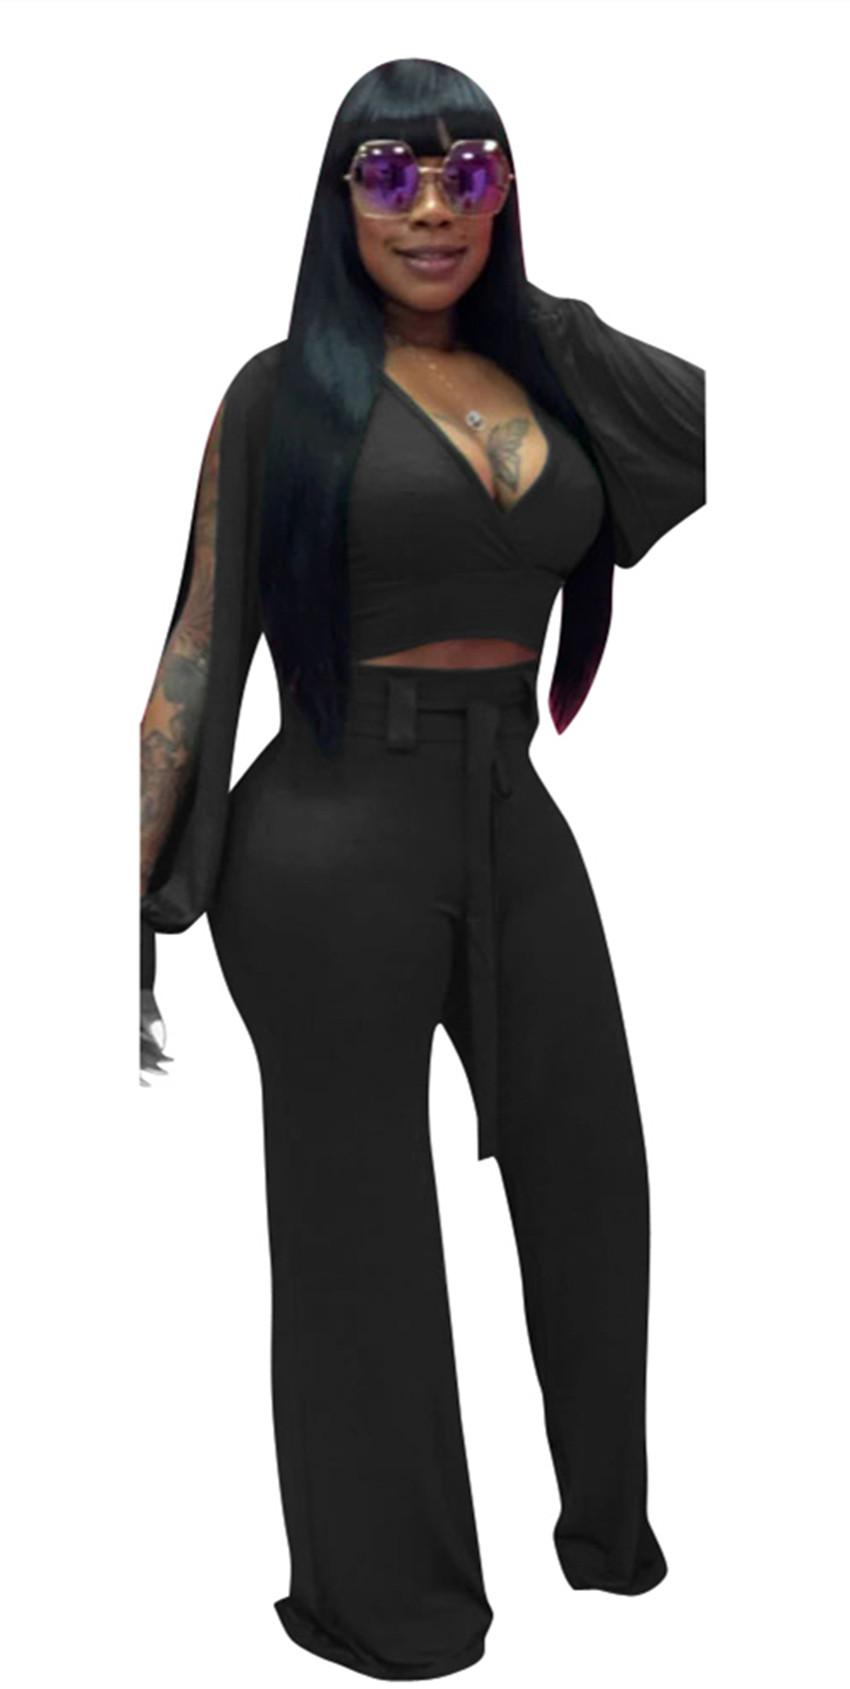 41b3897d8230 Women Sexy V-Neck Long Sleeve Jumpsuit Black. Loading zoom